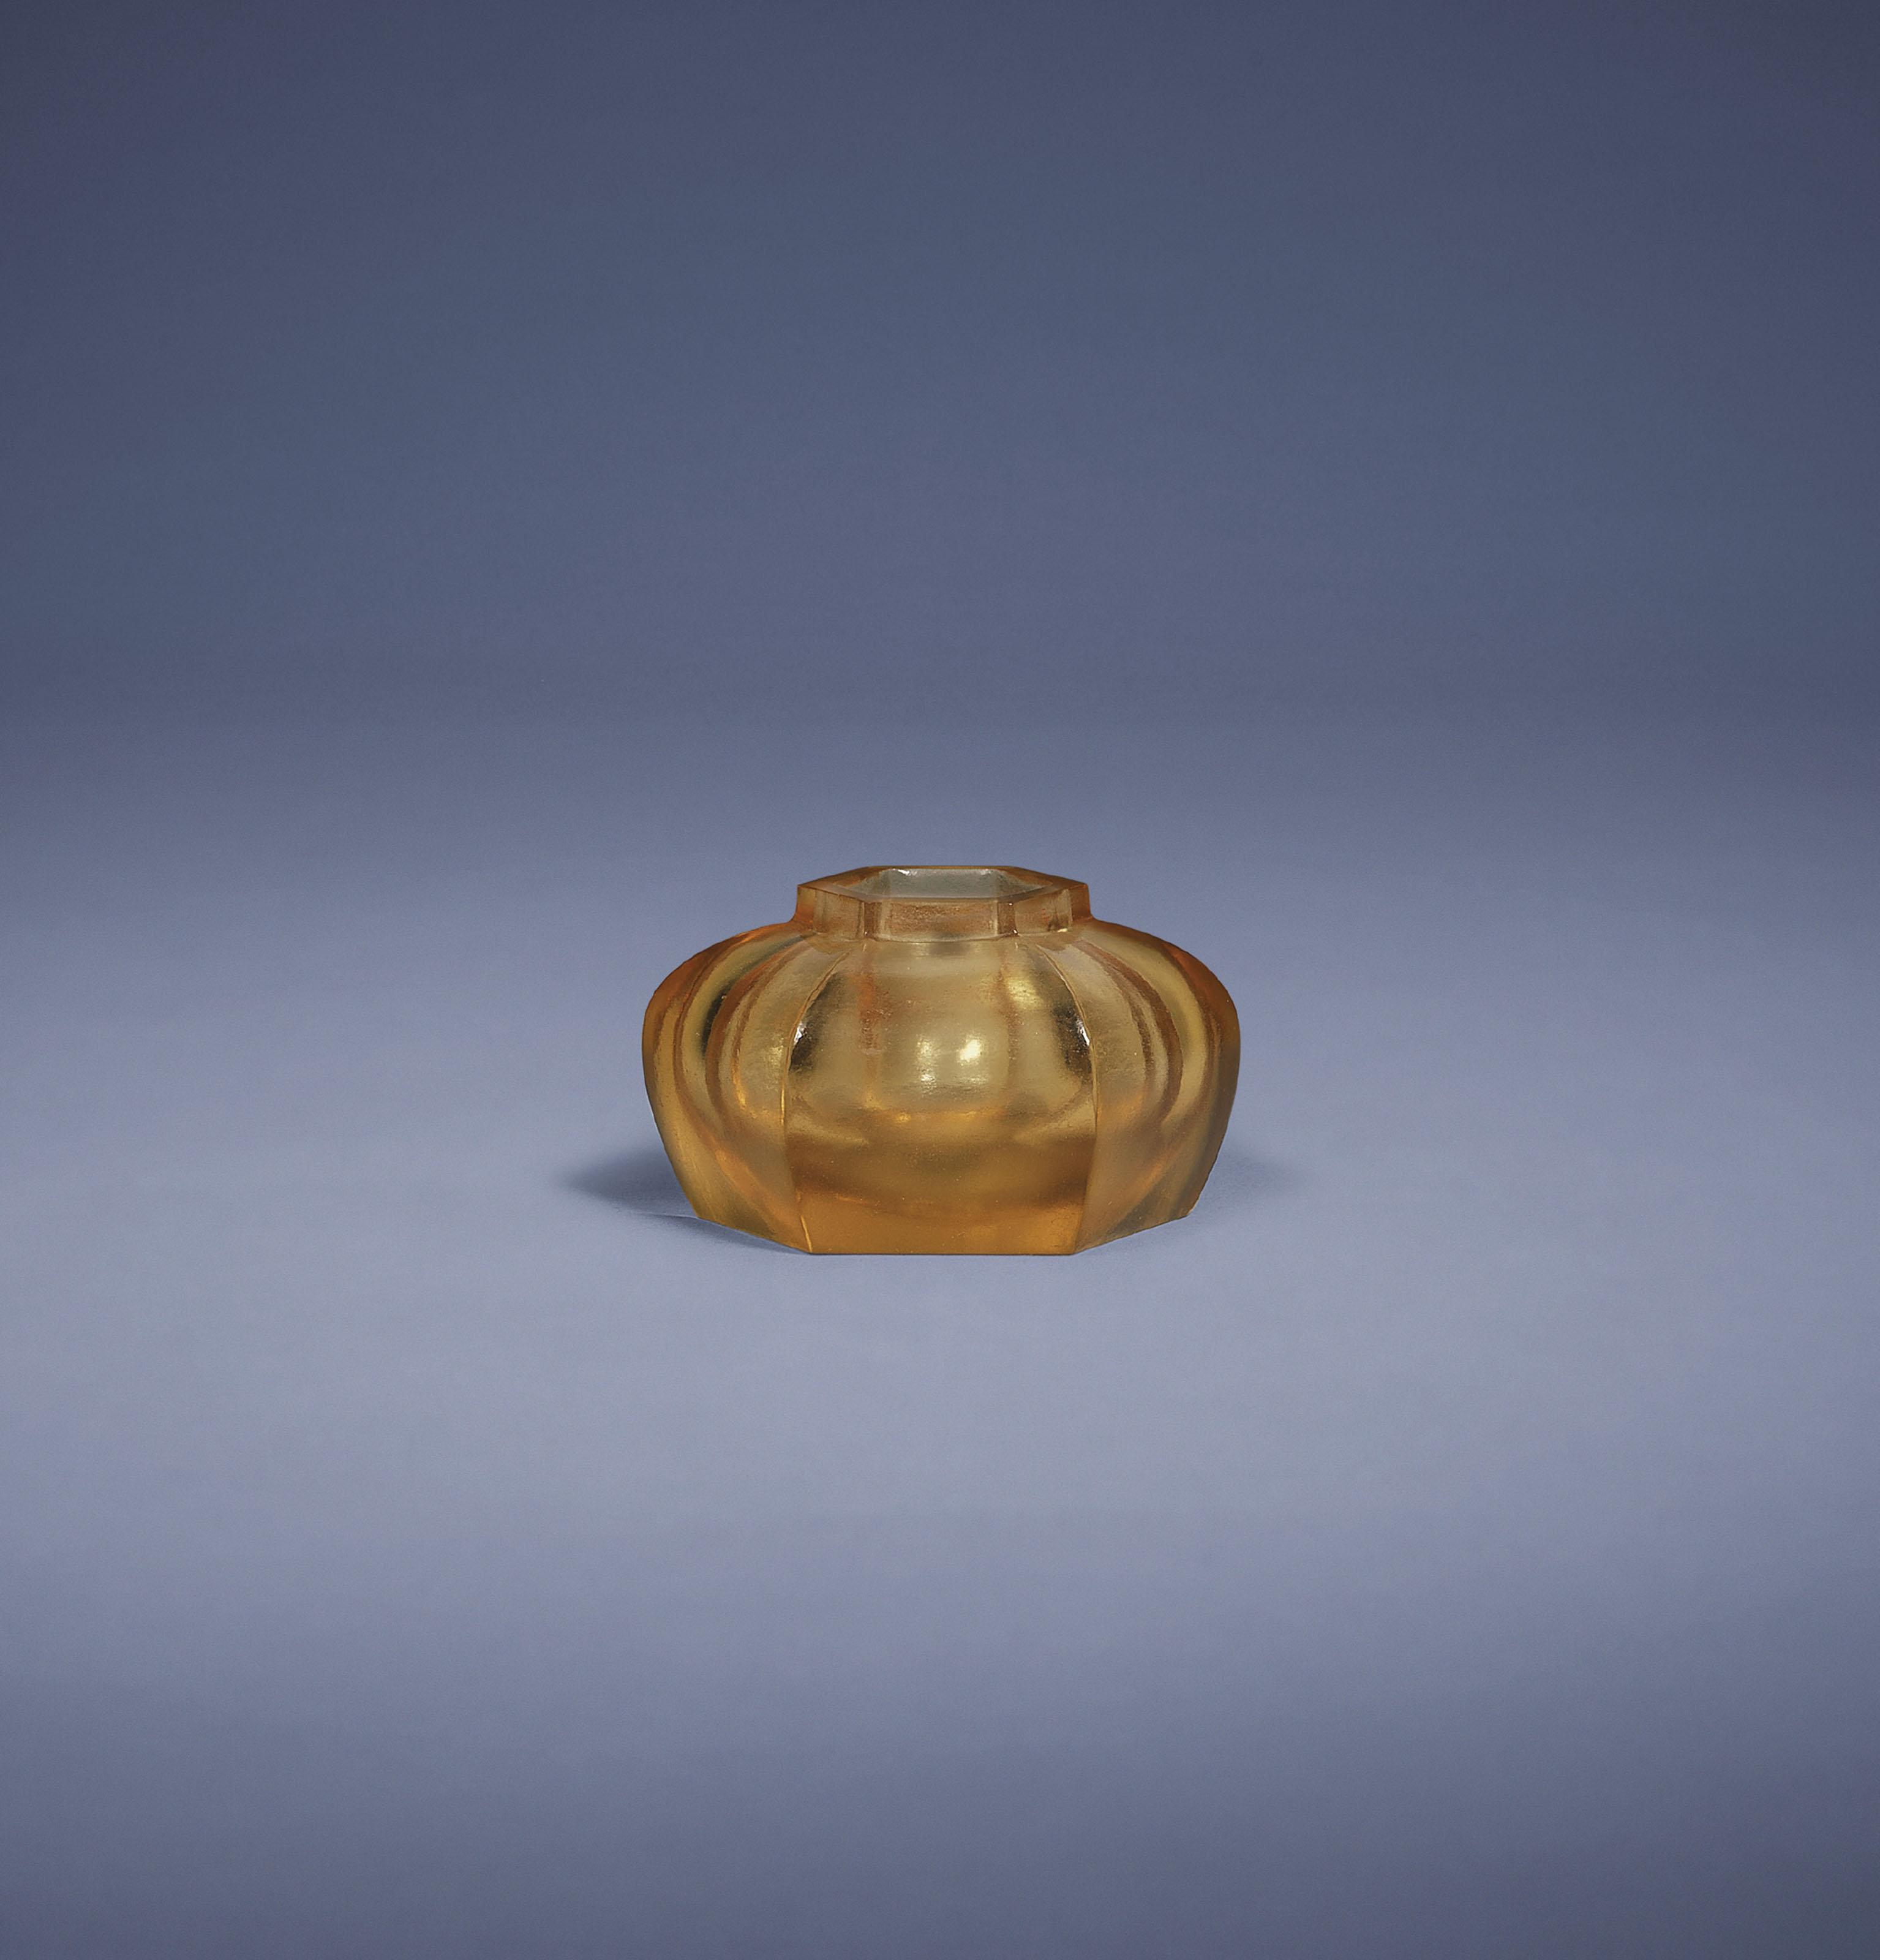 A SMALL TRANSPARENT AMBER GLAS